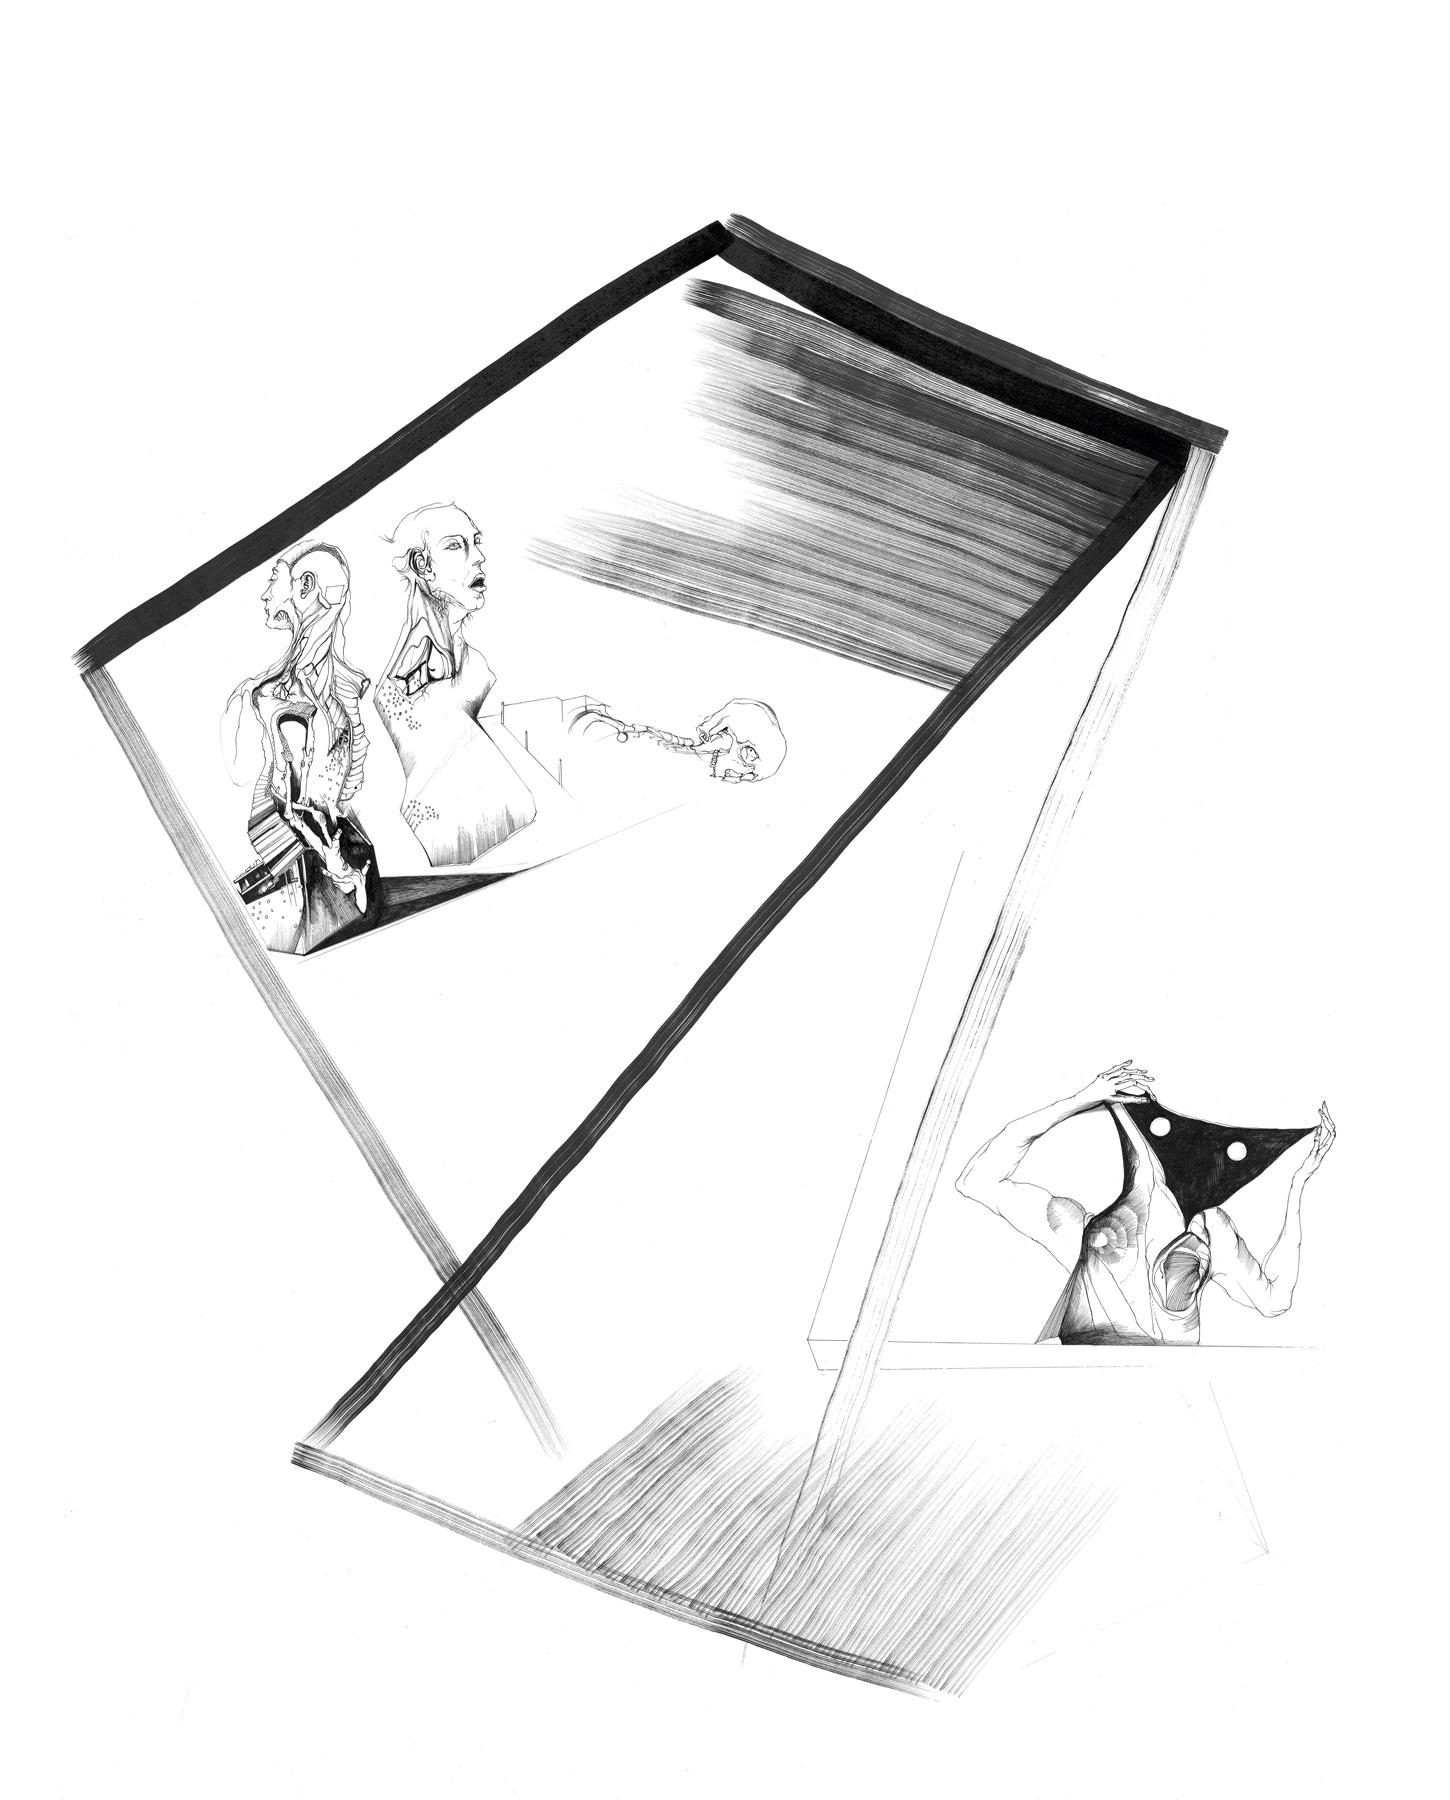 Nina Annabelle Märkl | Balancing the Whimsical 16 | Ink on paper | 60 x 48 cm | 2016